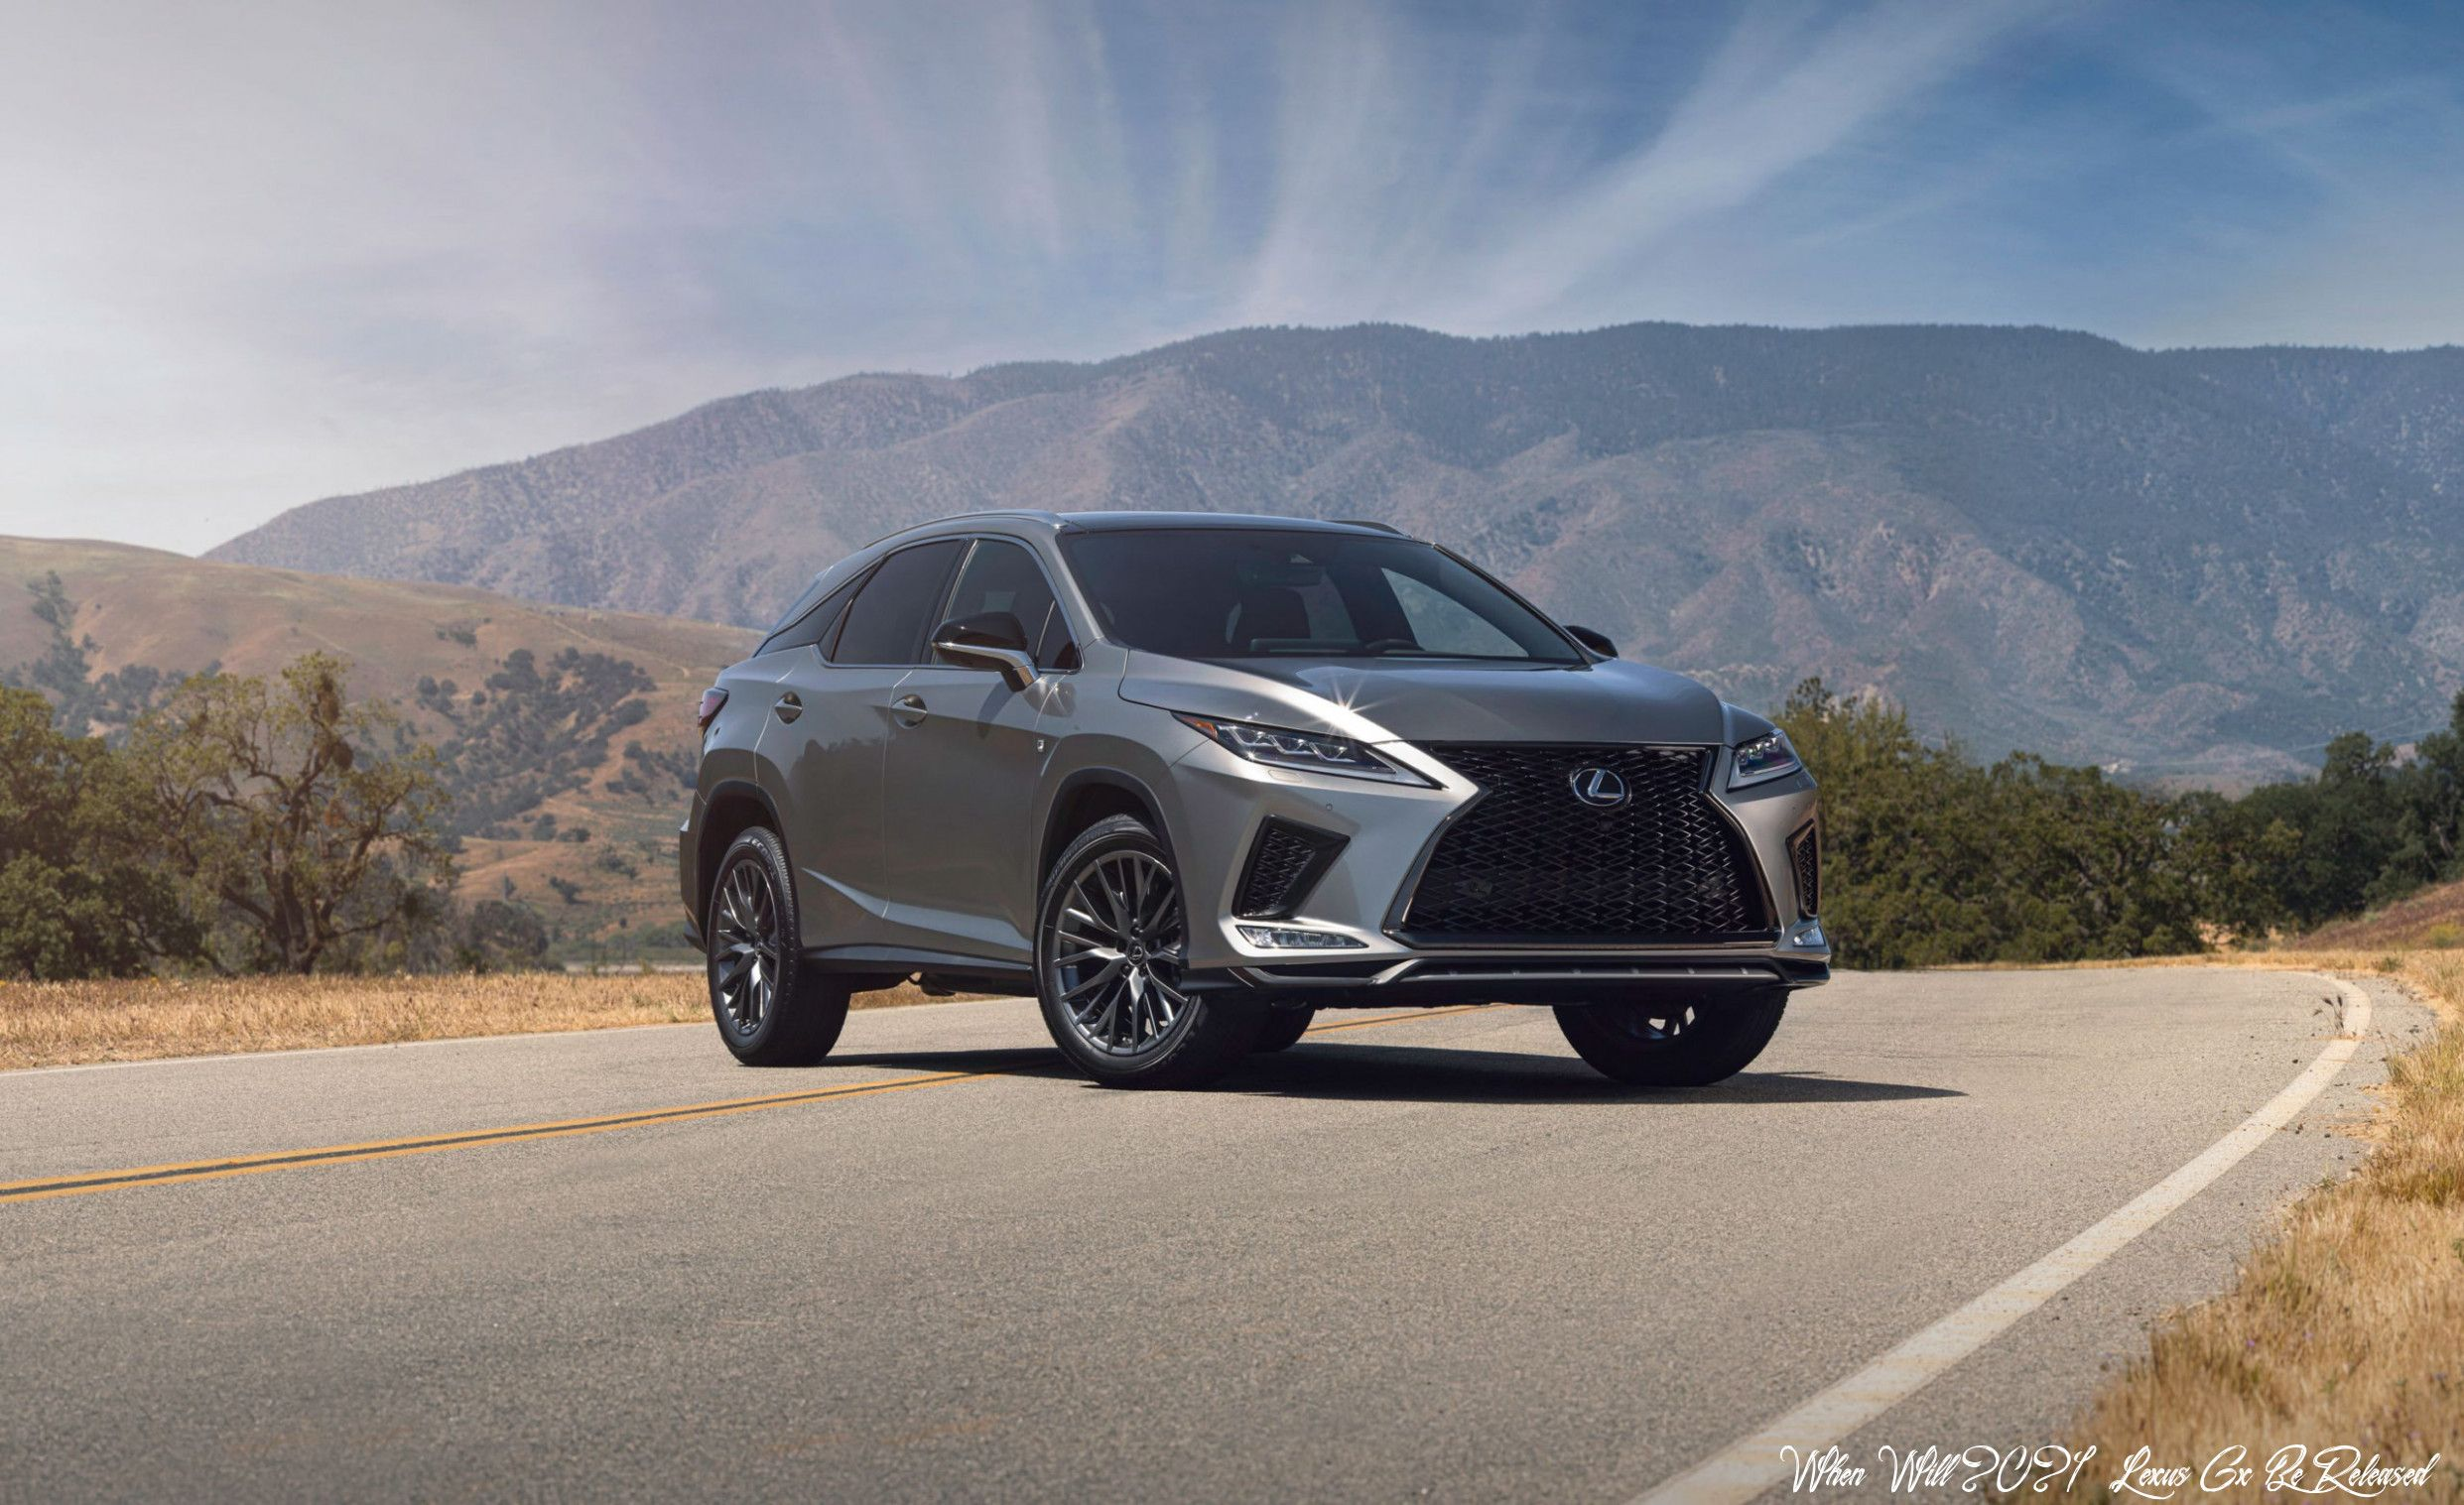 When Will 2021 Lexus Gx Be Released New Review In 2020 Lexus Gx Lexus Suv Lexus